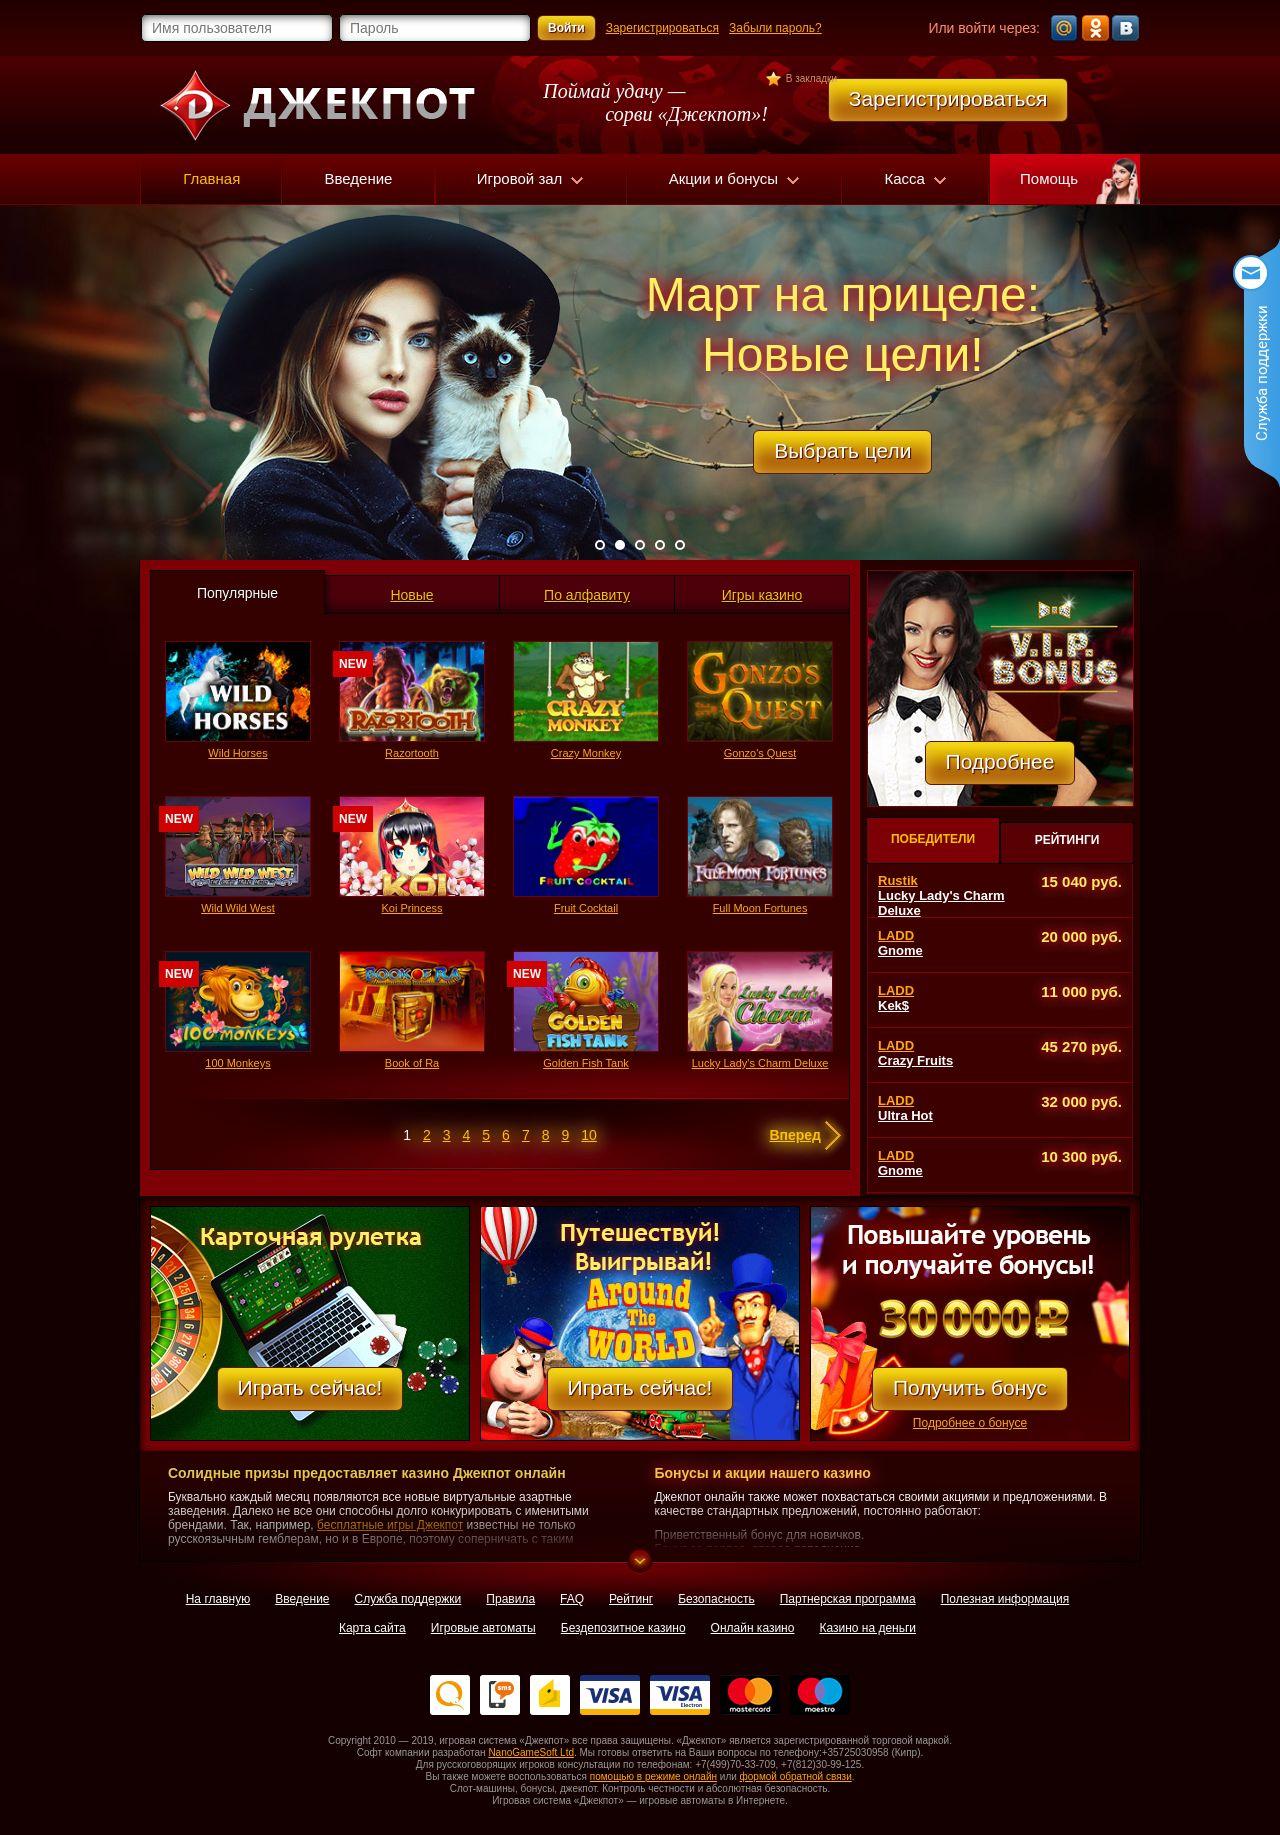 Jackpot casino contact us